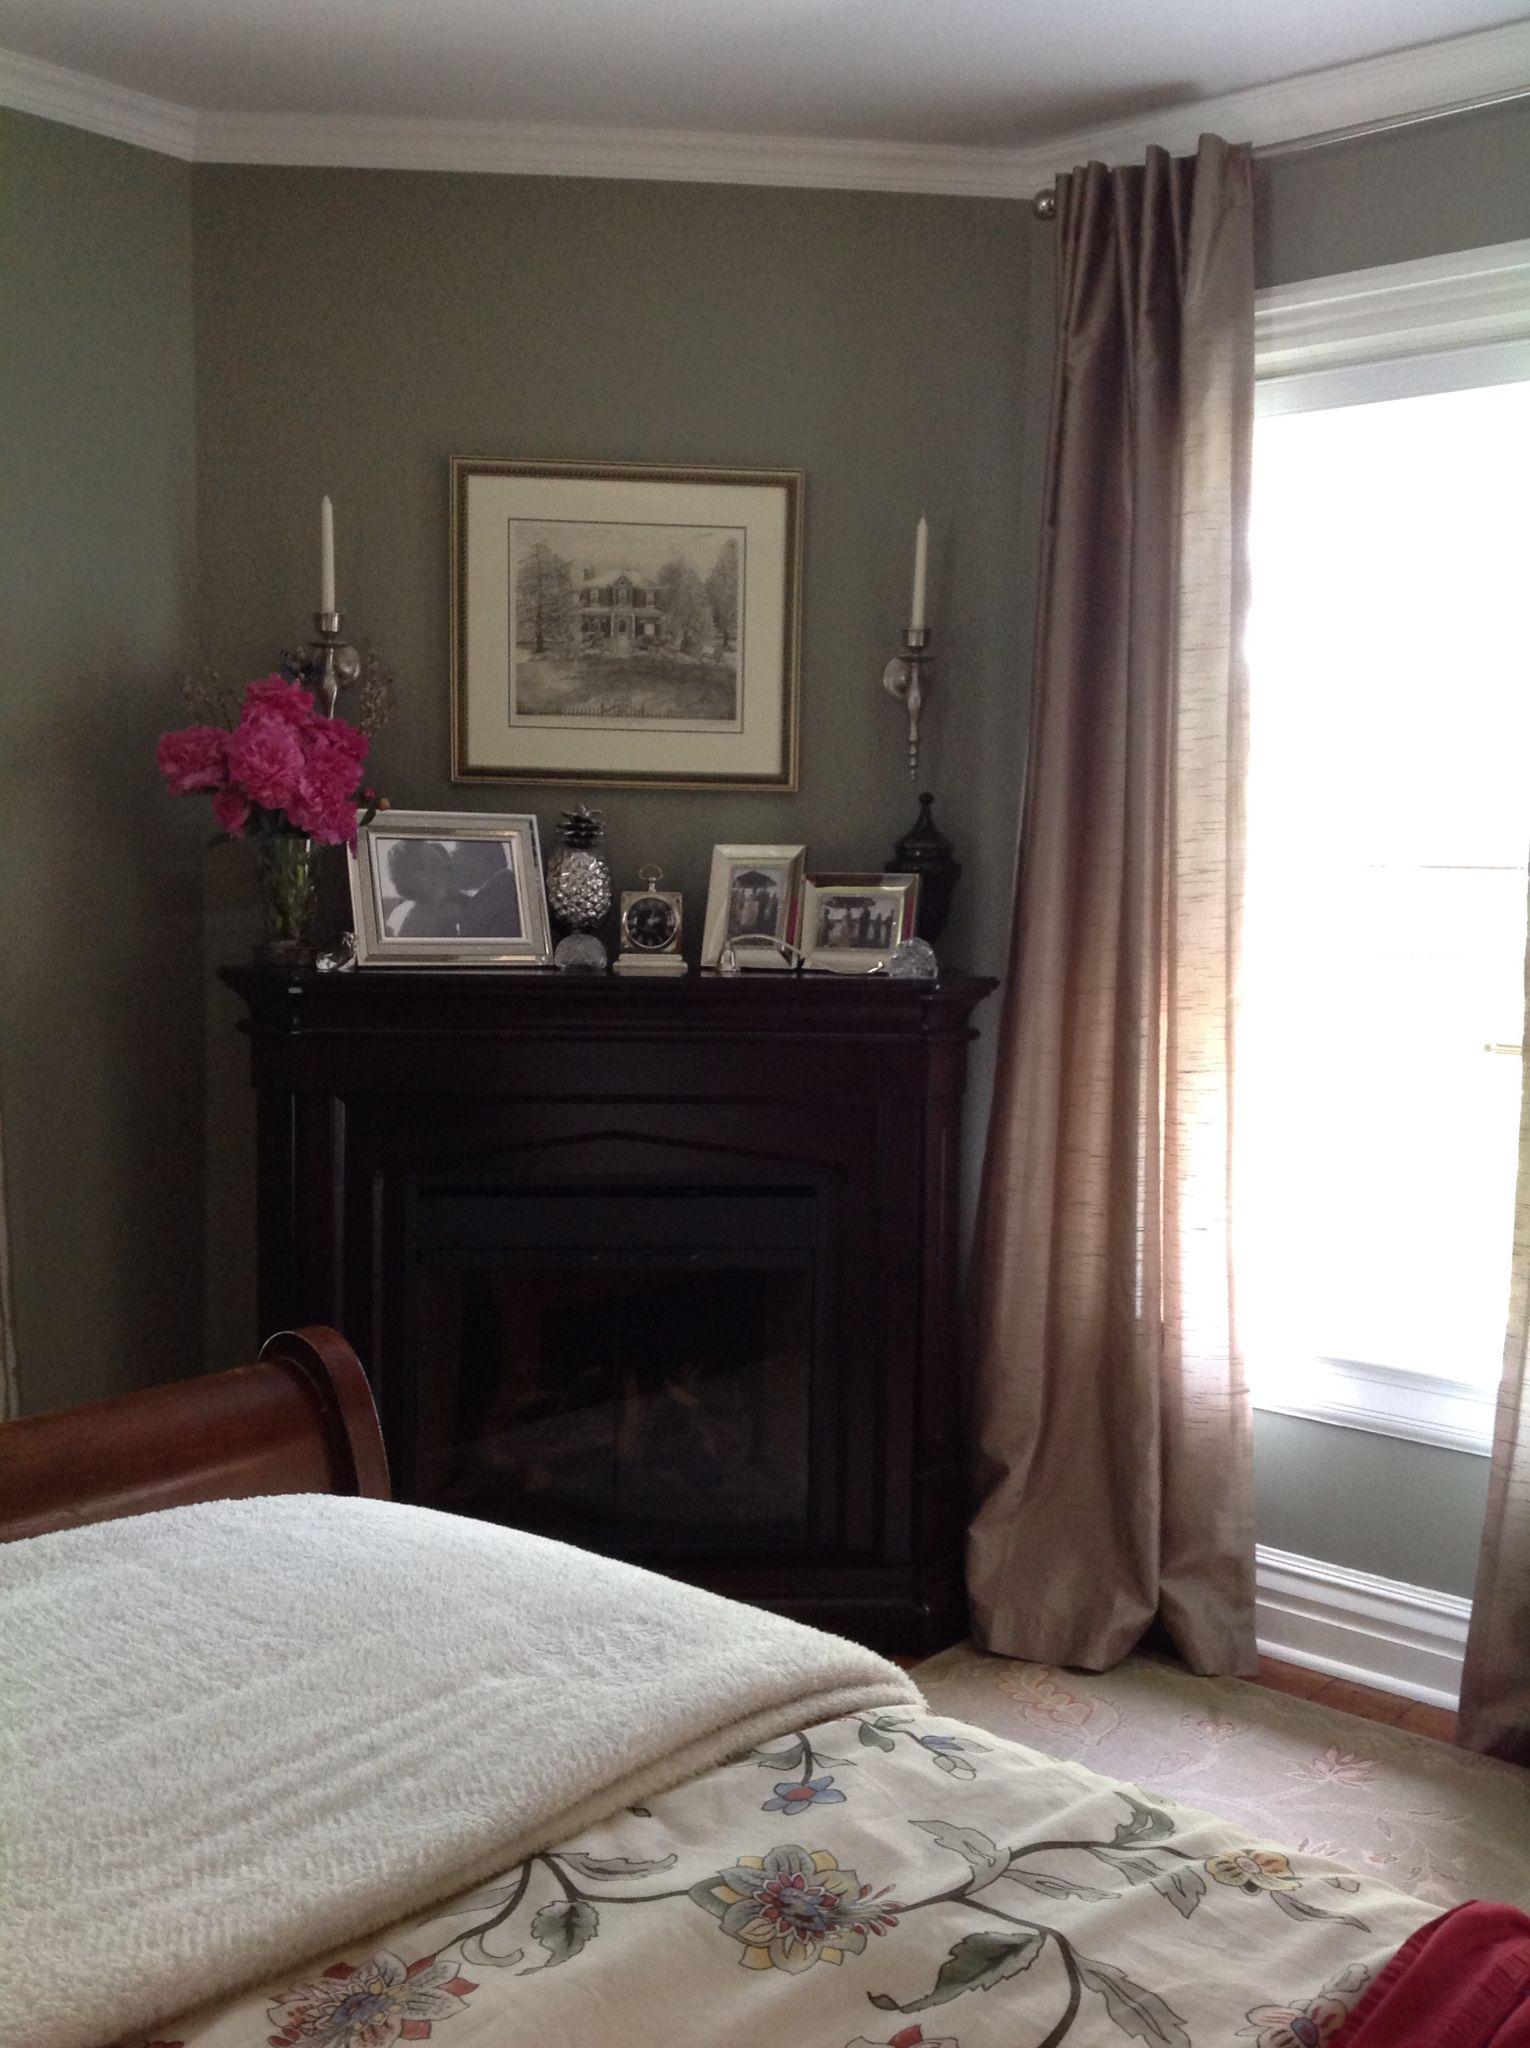 b moore creekside green 2141 40 warm grey green benjamin moore paint colour bedroom green. Black Bedroom Furniture Sets. Home Design Ideas